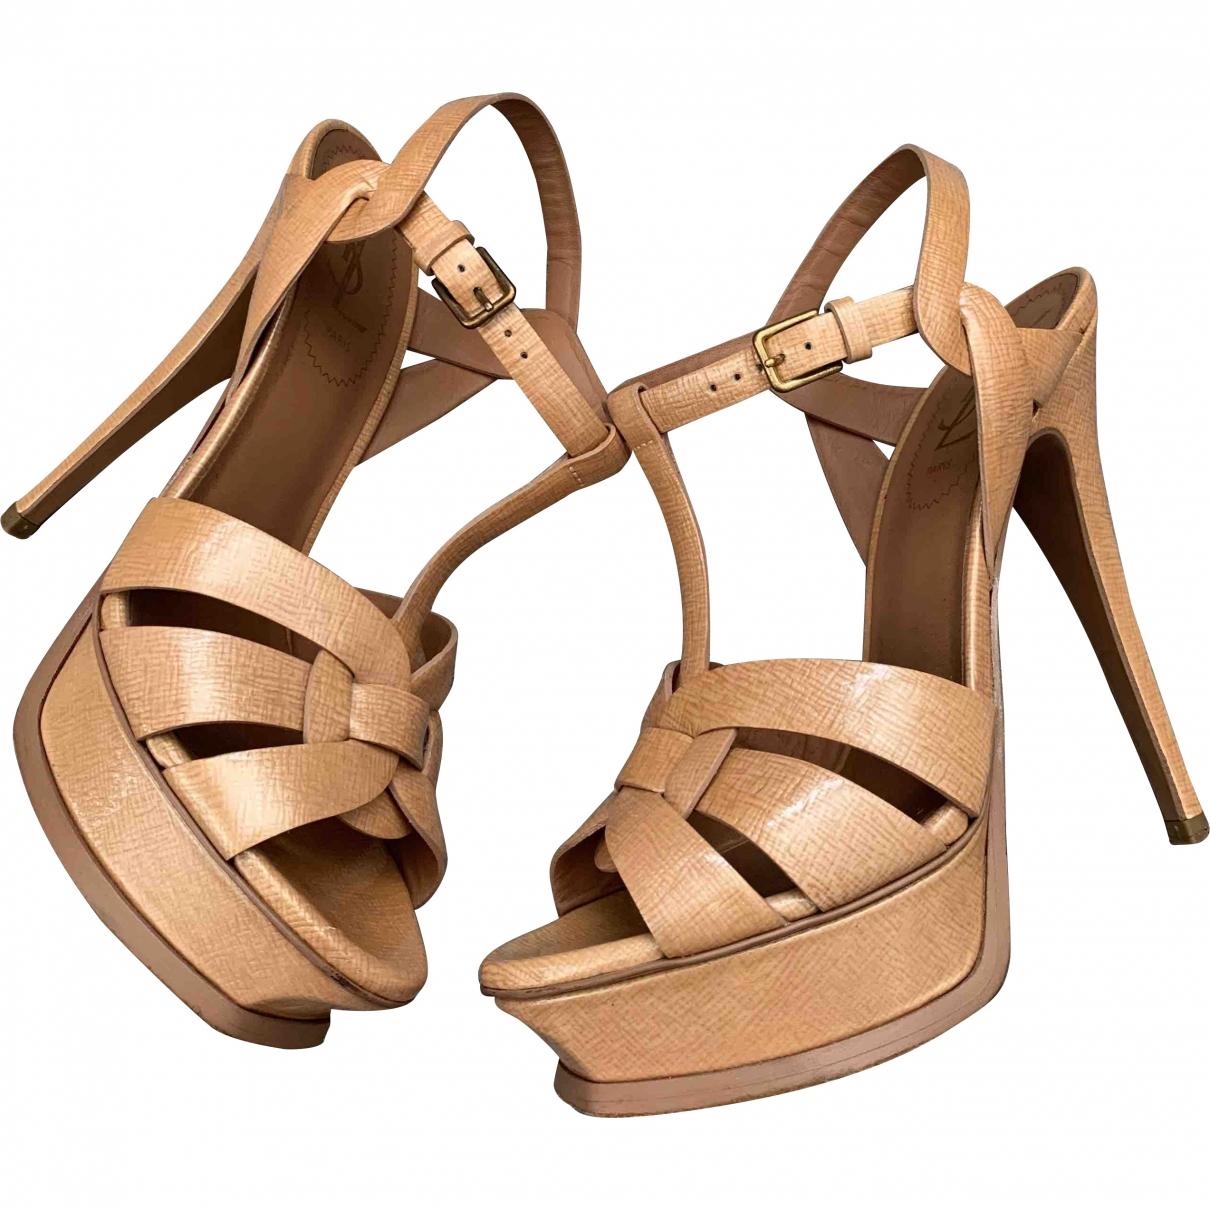 Yves Saint Laurent Tribute Beige Leather Sandals for Women 37.5 EU